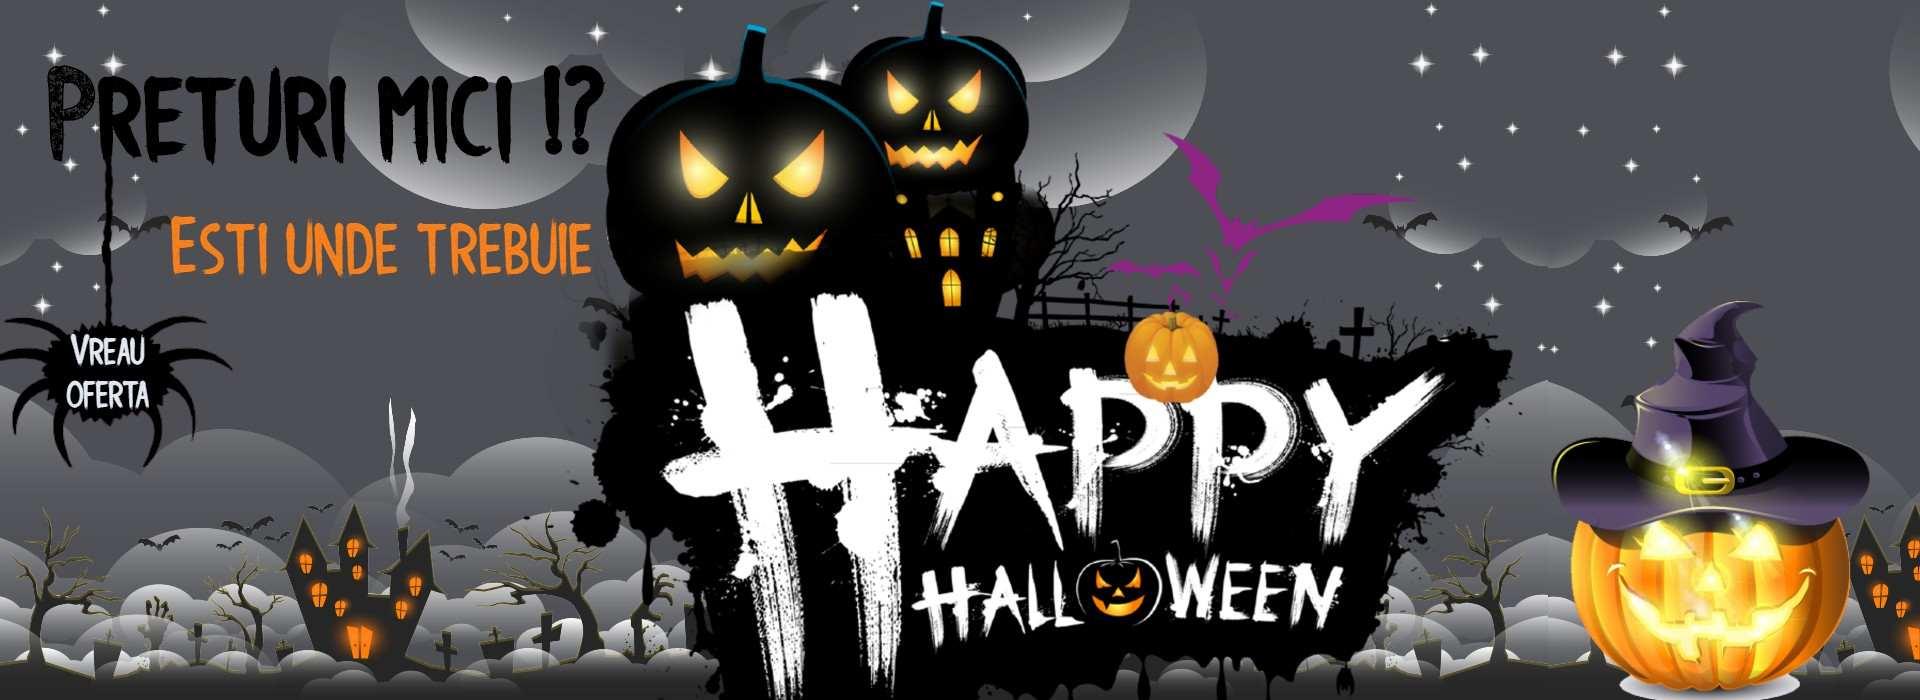 Profita de reduceri! Happy Halloween!